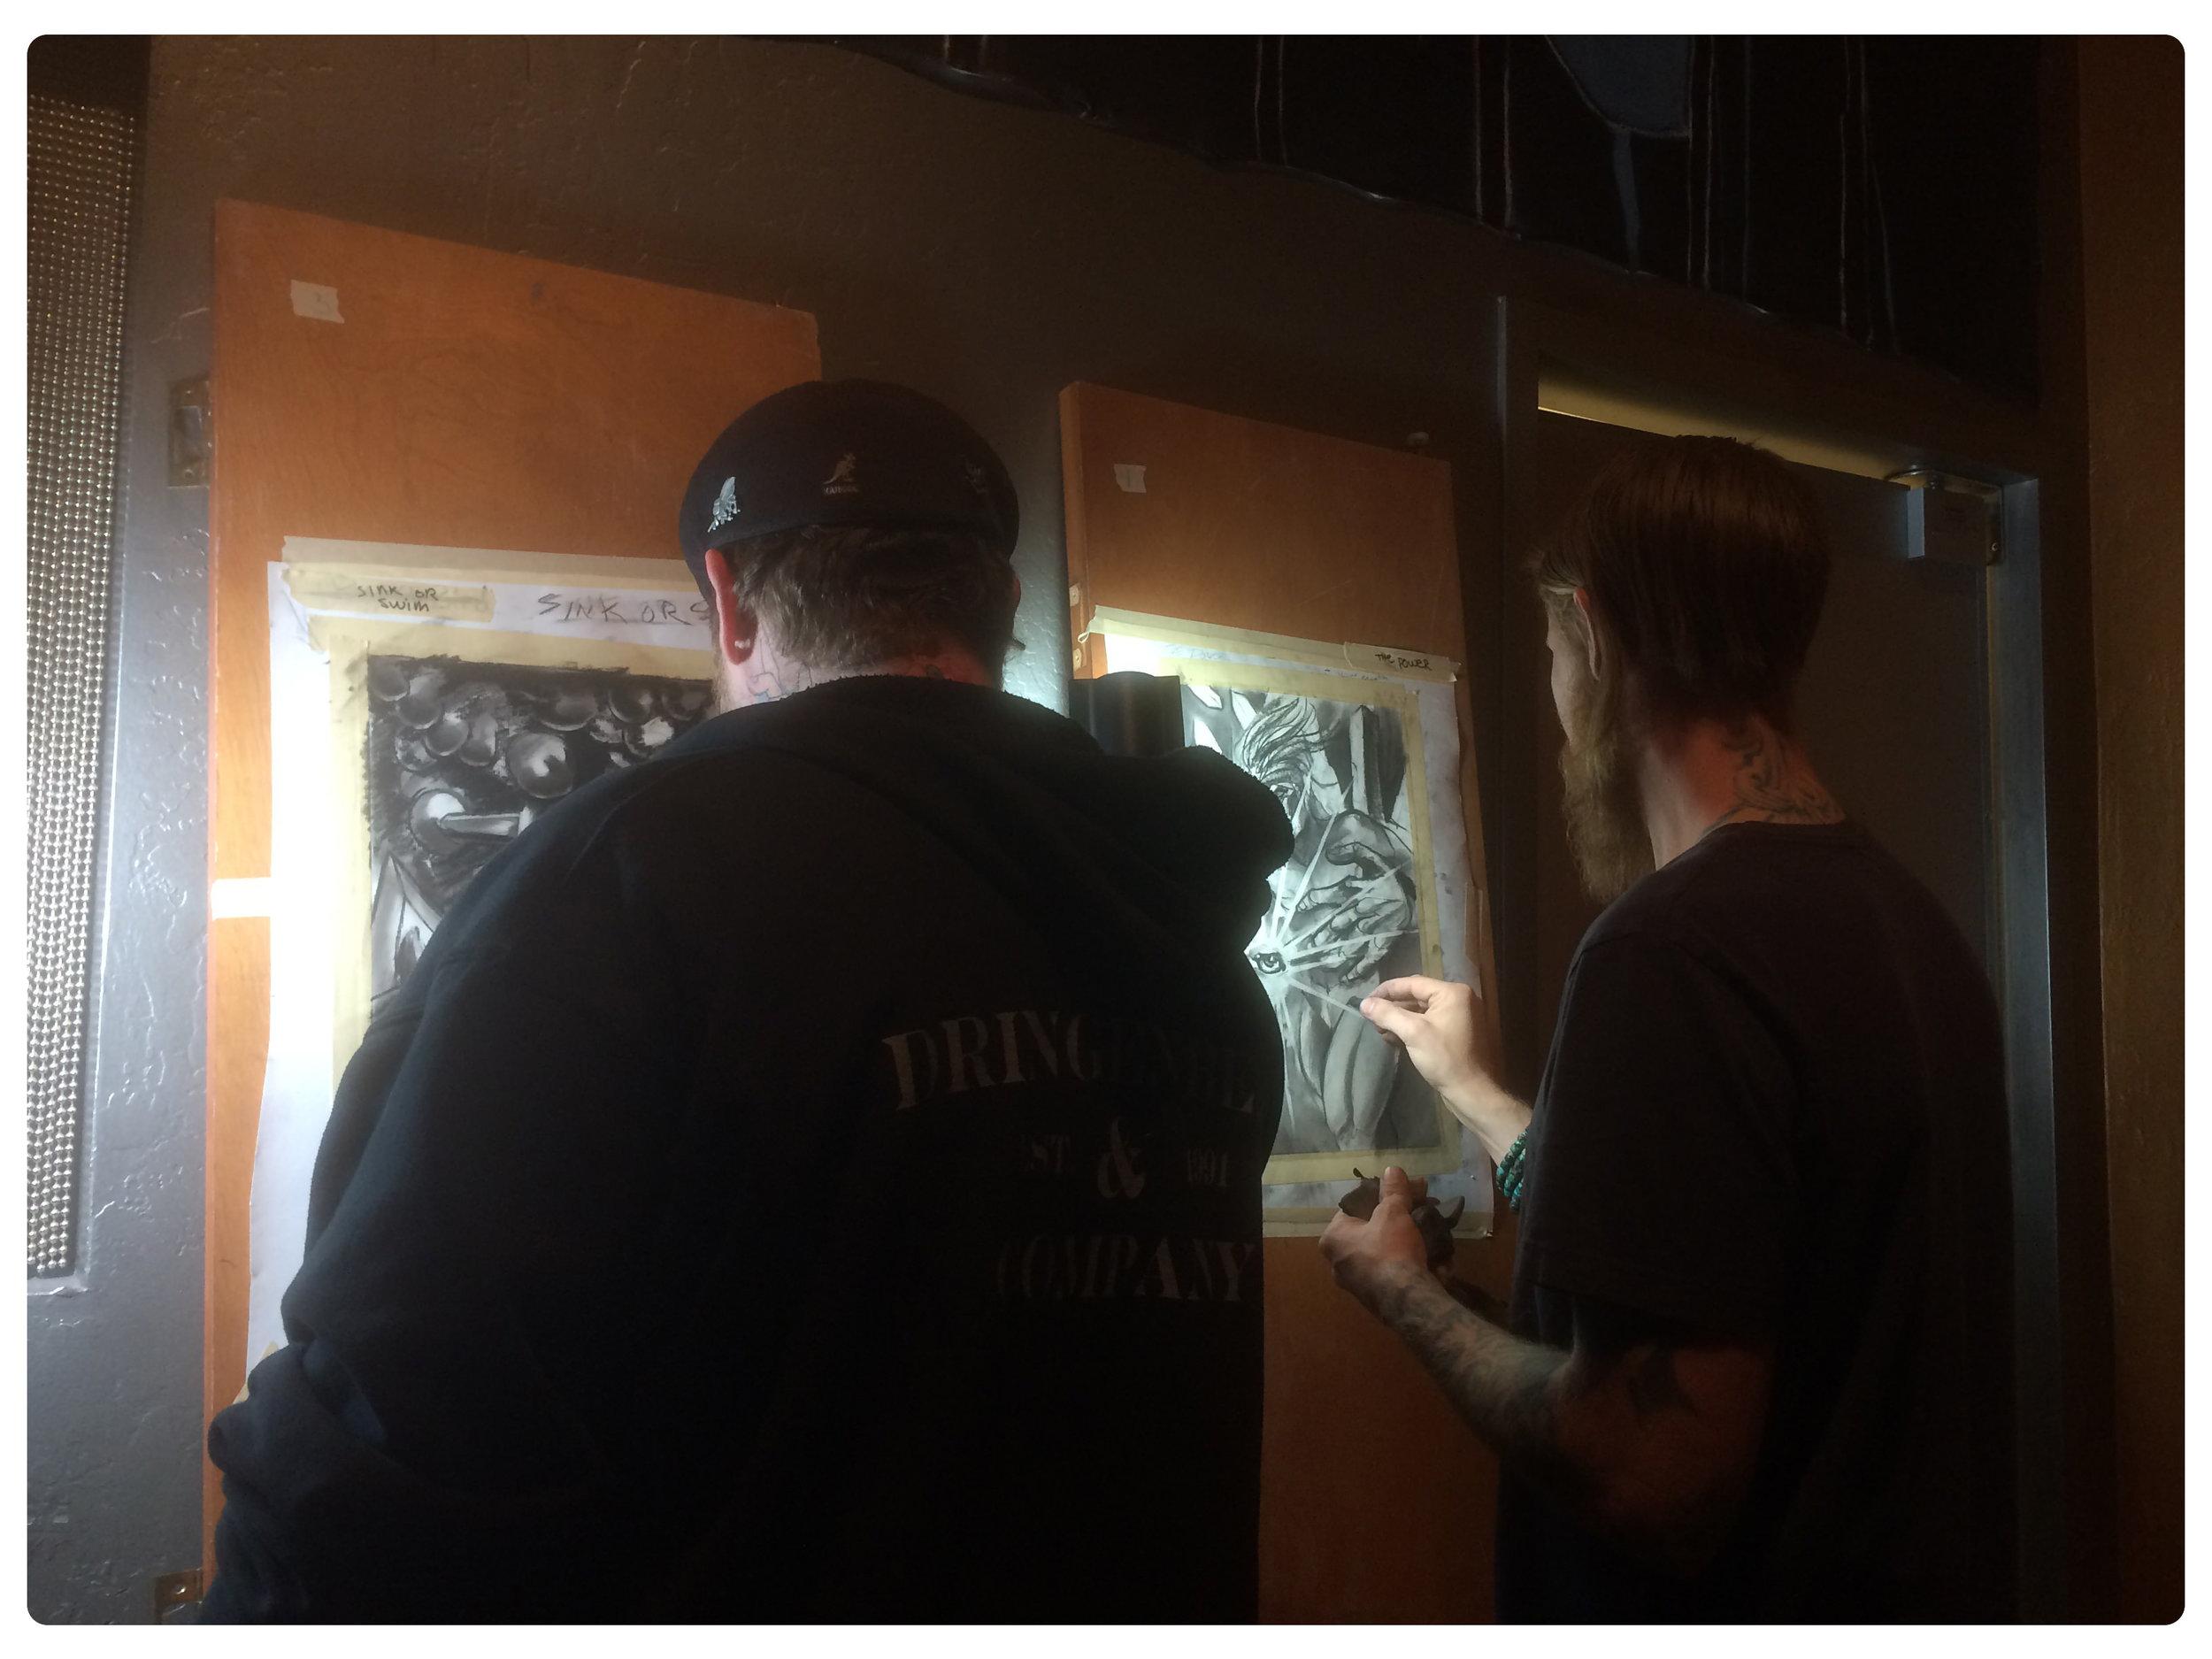 blog_2014_art_live-drawing-event-charcoal-1.jpg